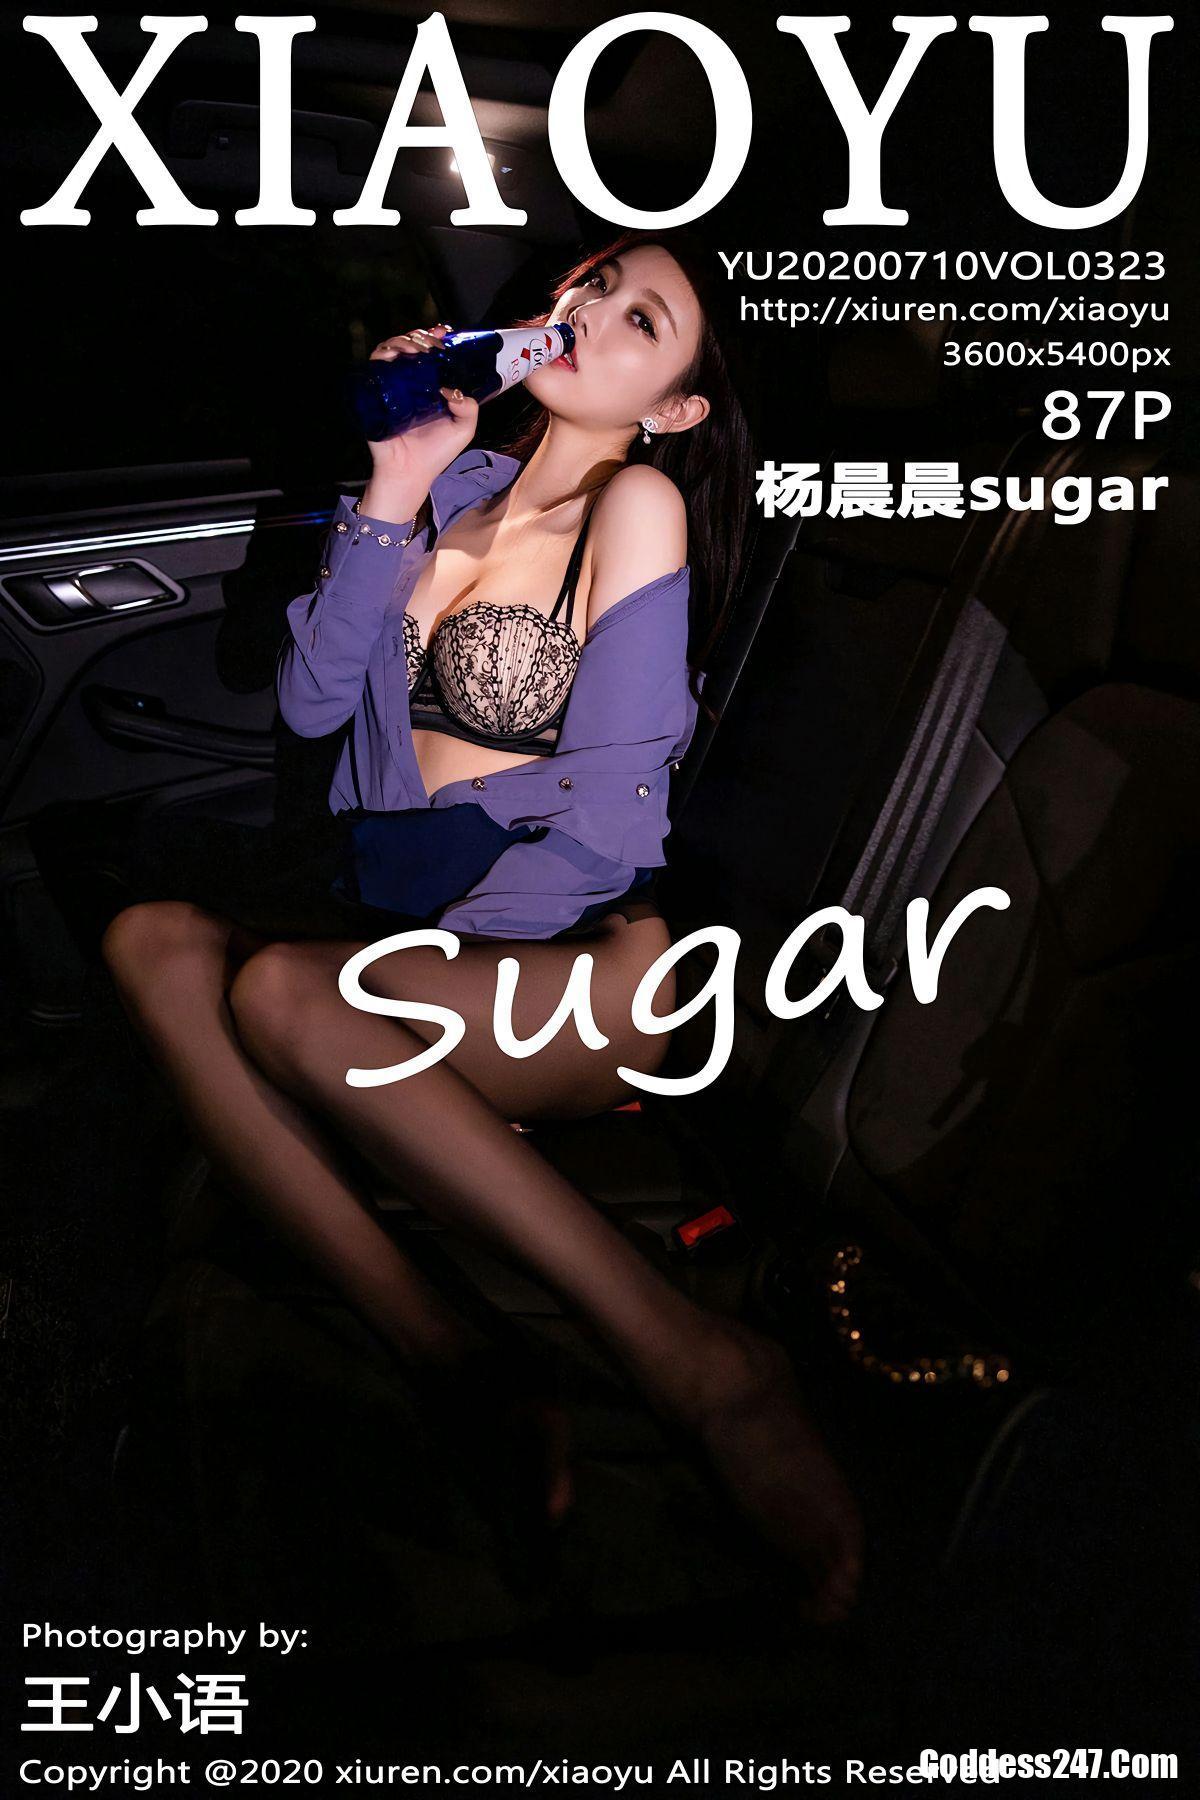 XiaoYu Vol.323 杨晨晨sugar